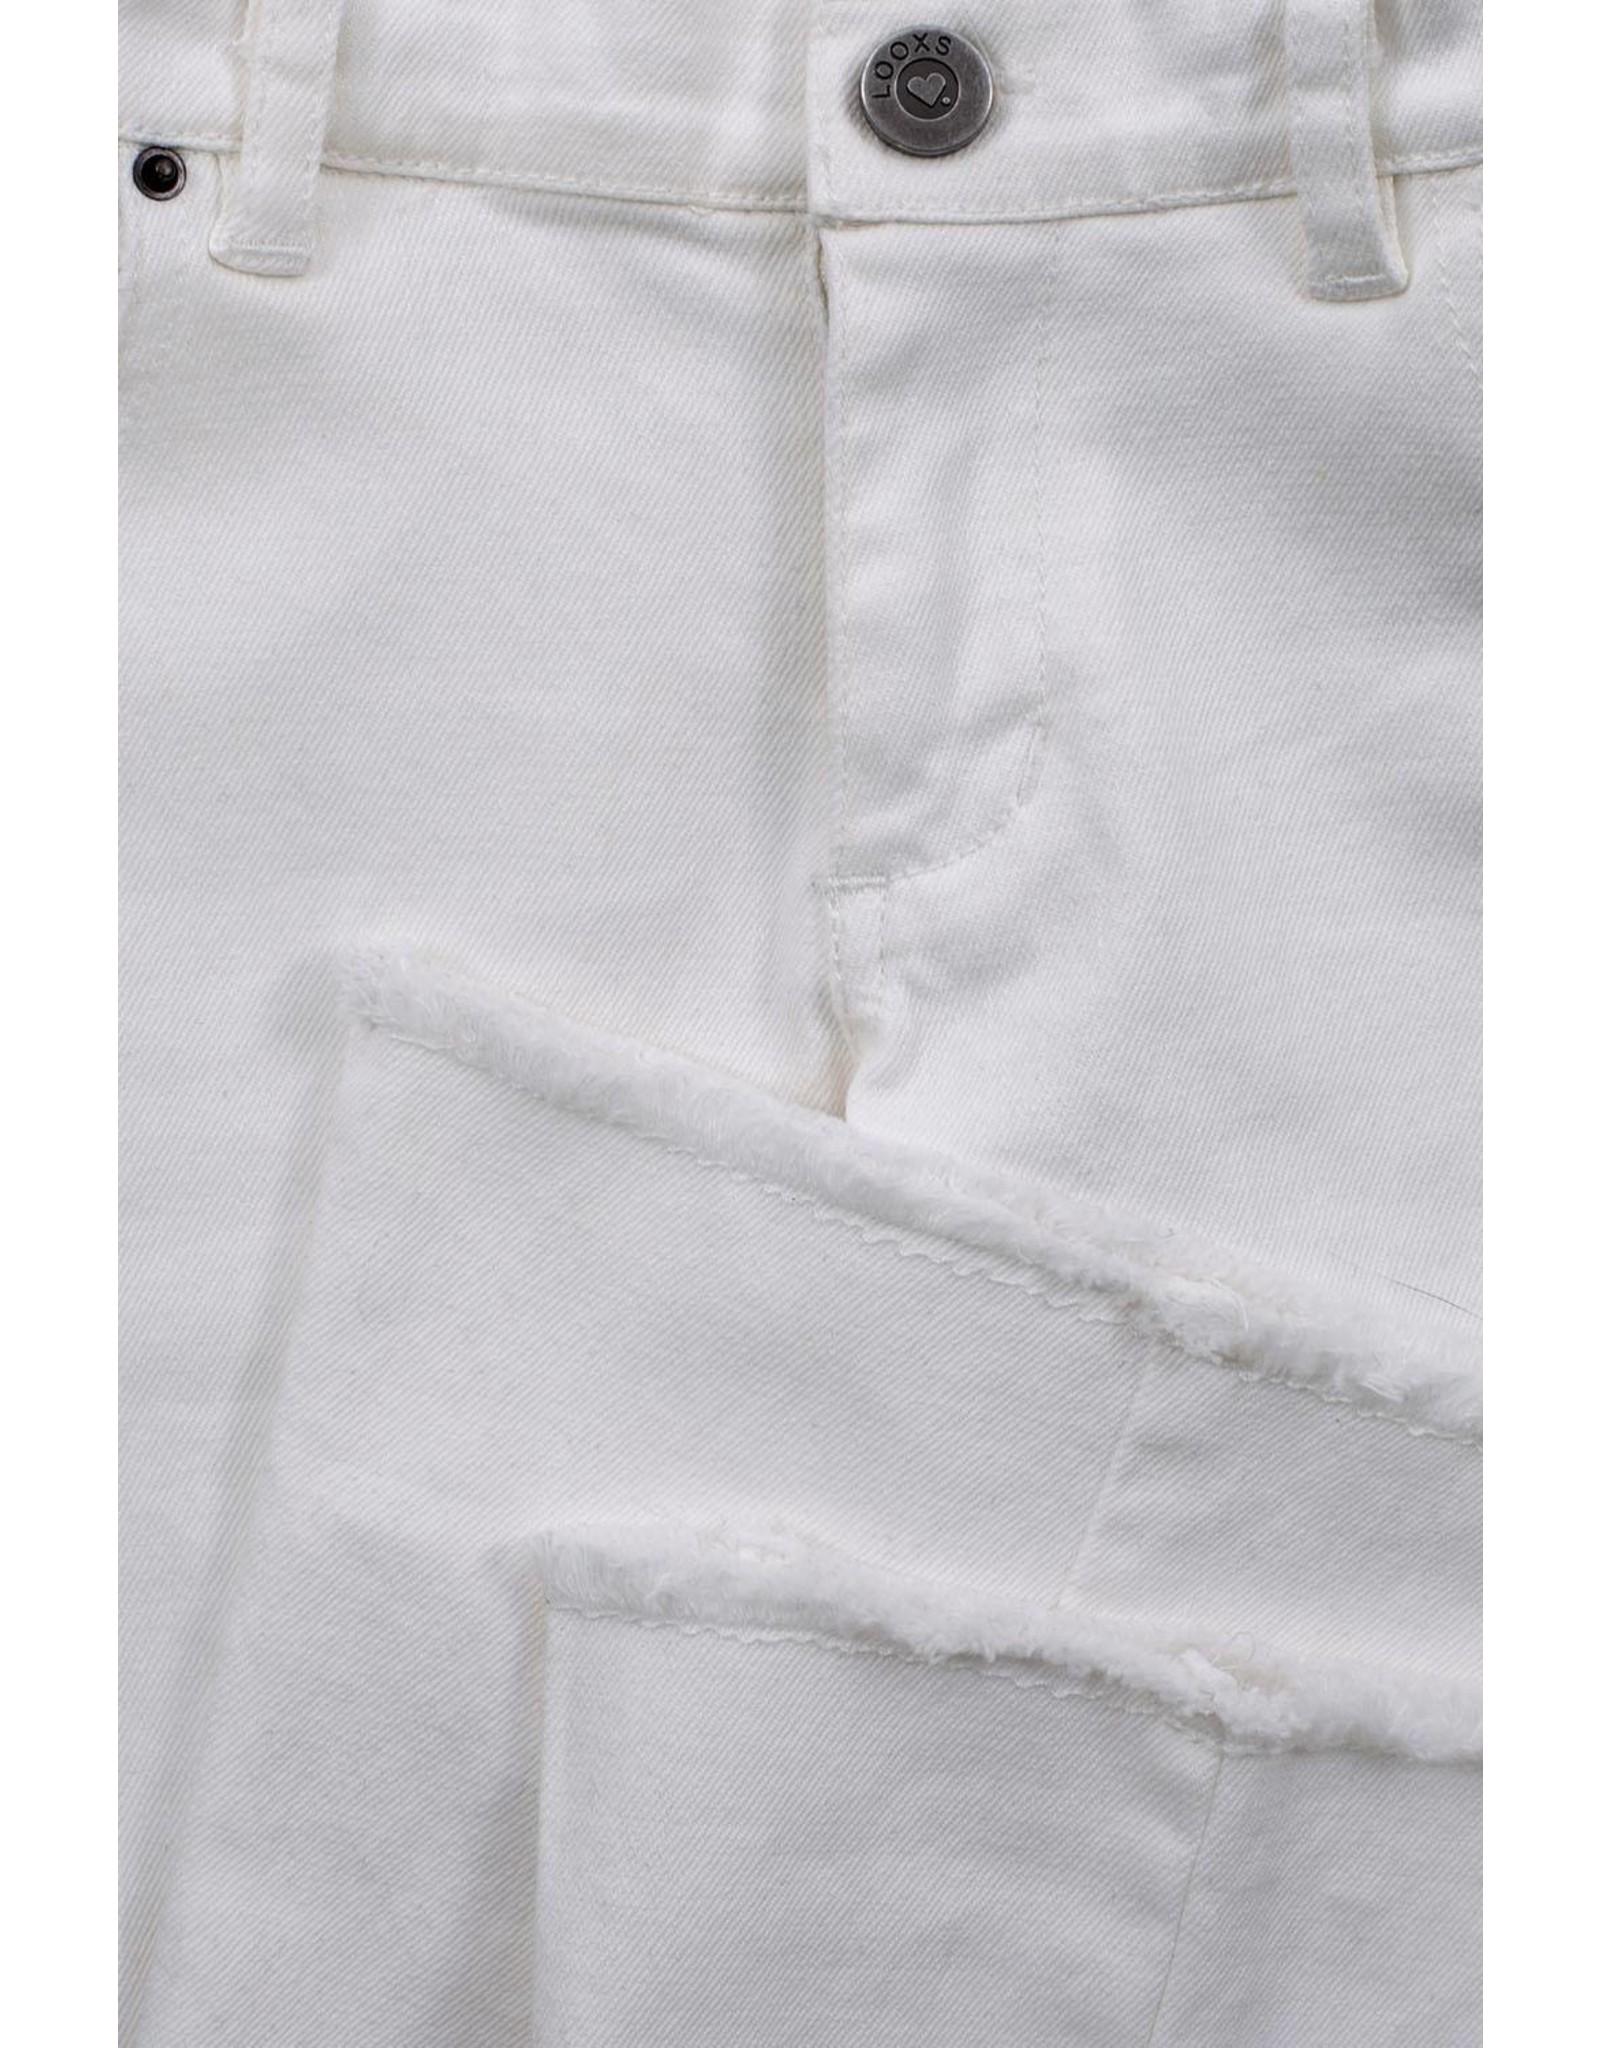 Looxs 10SIXTEEN 10Sixteen Flare pants lilly